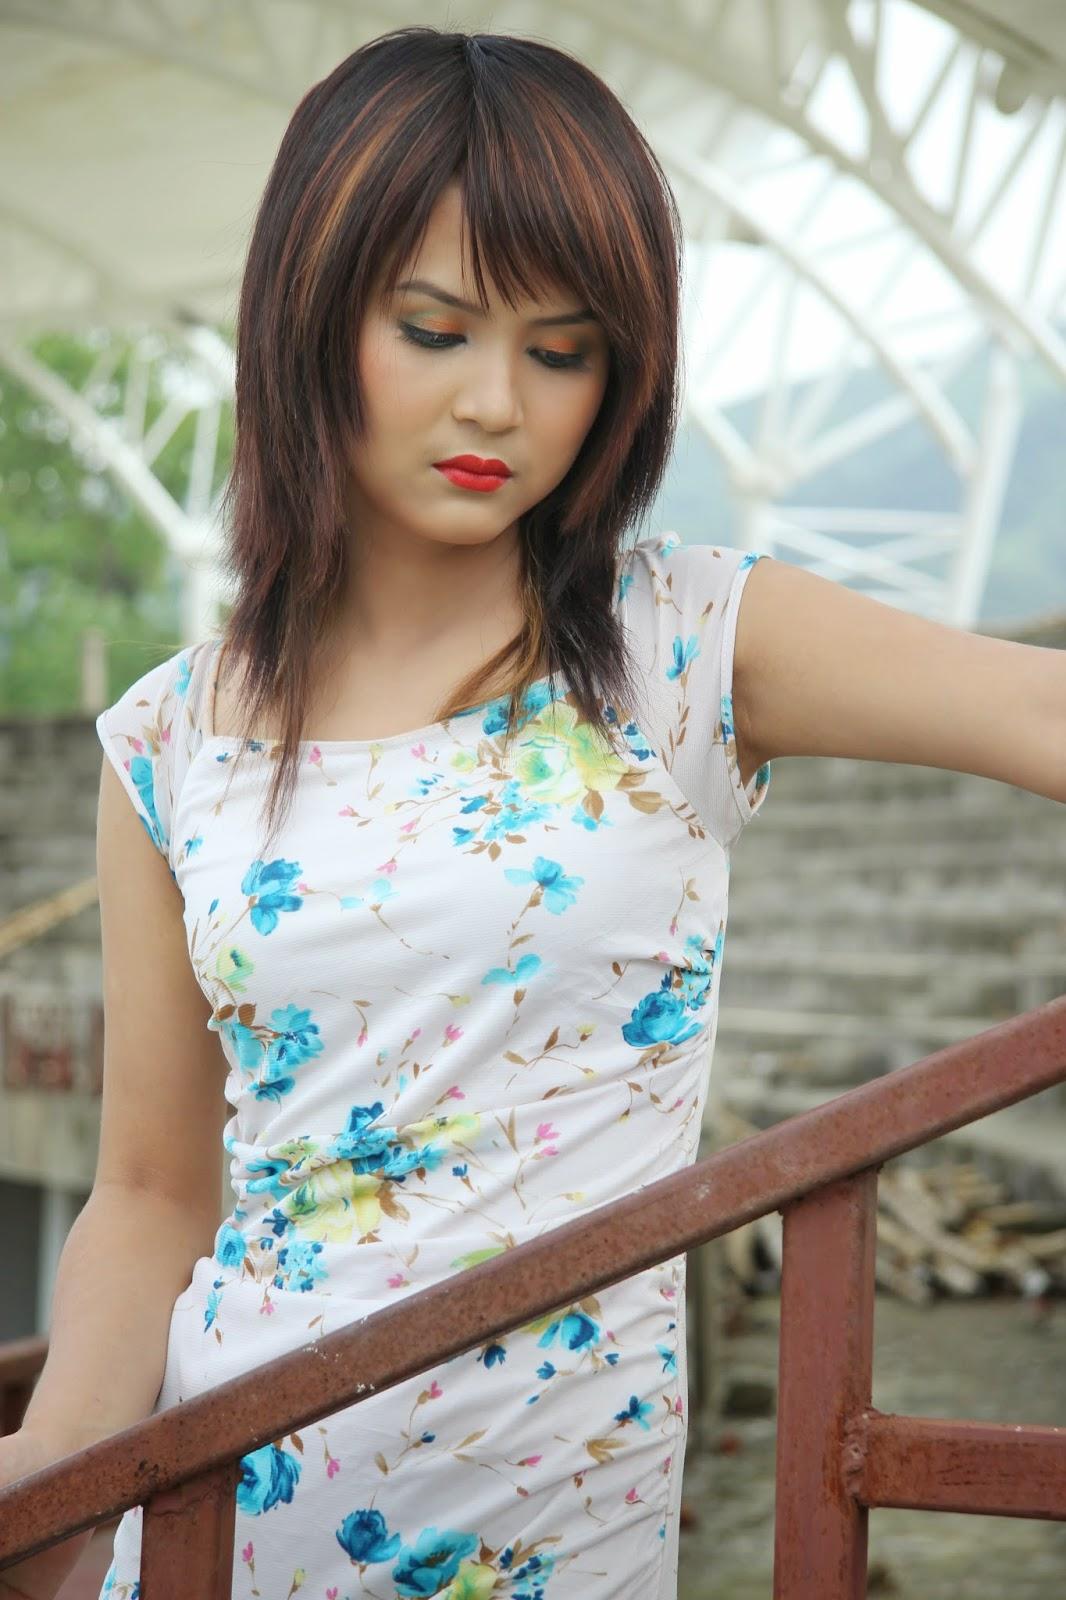 Manipuri Actress Bala shoots for South Indian Film - Sevendiary ...